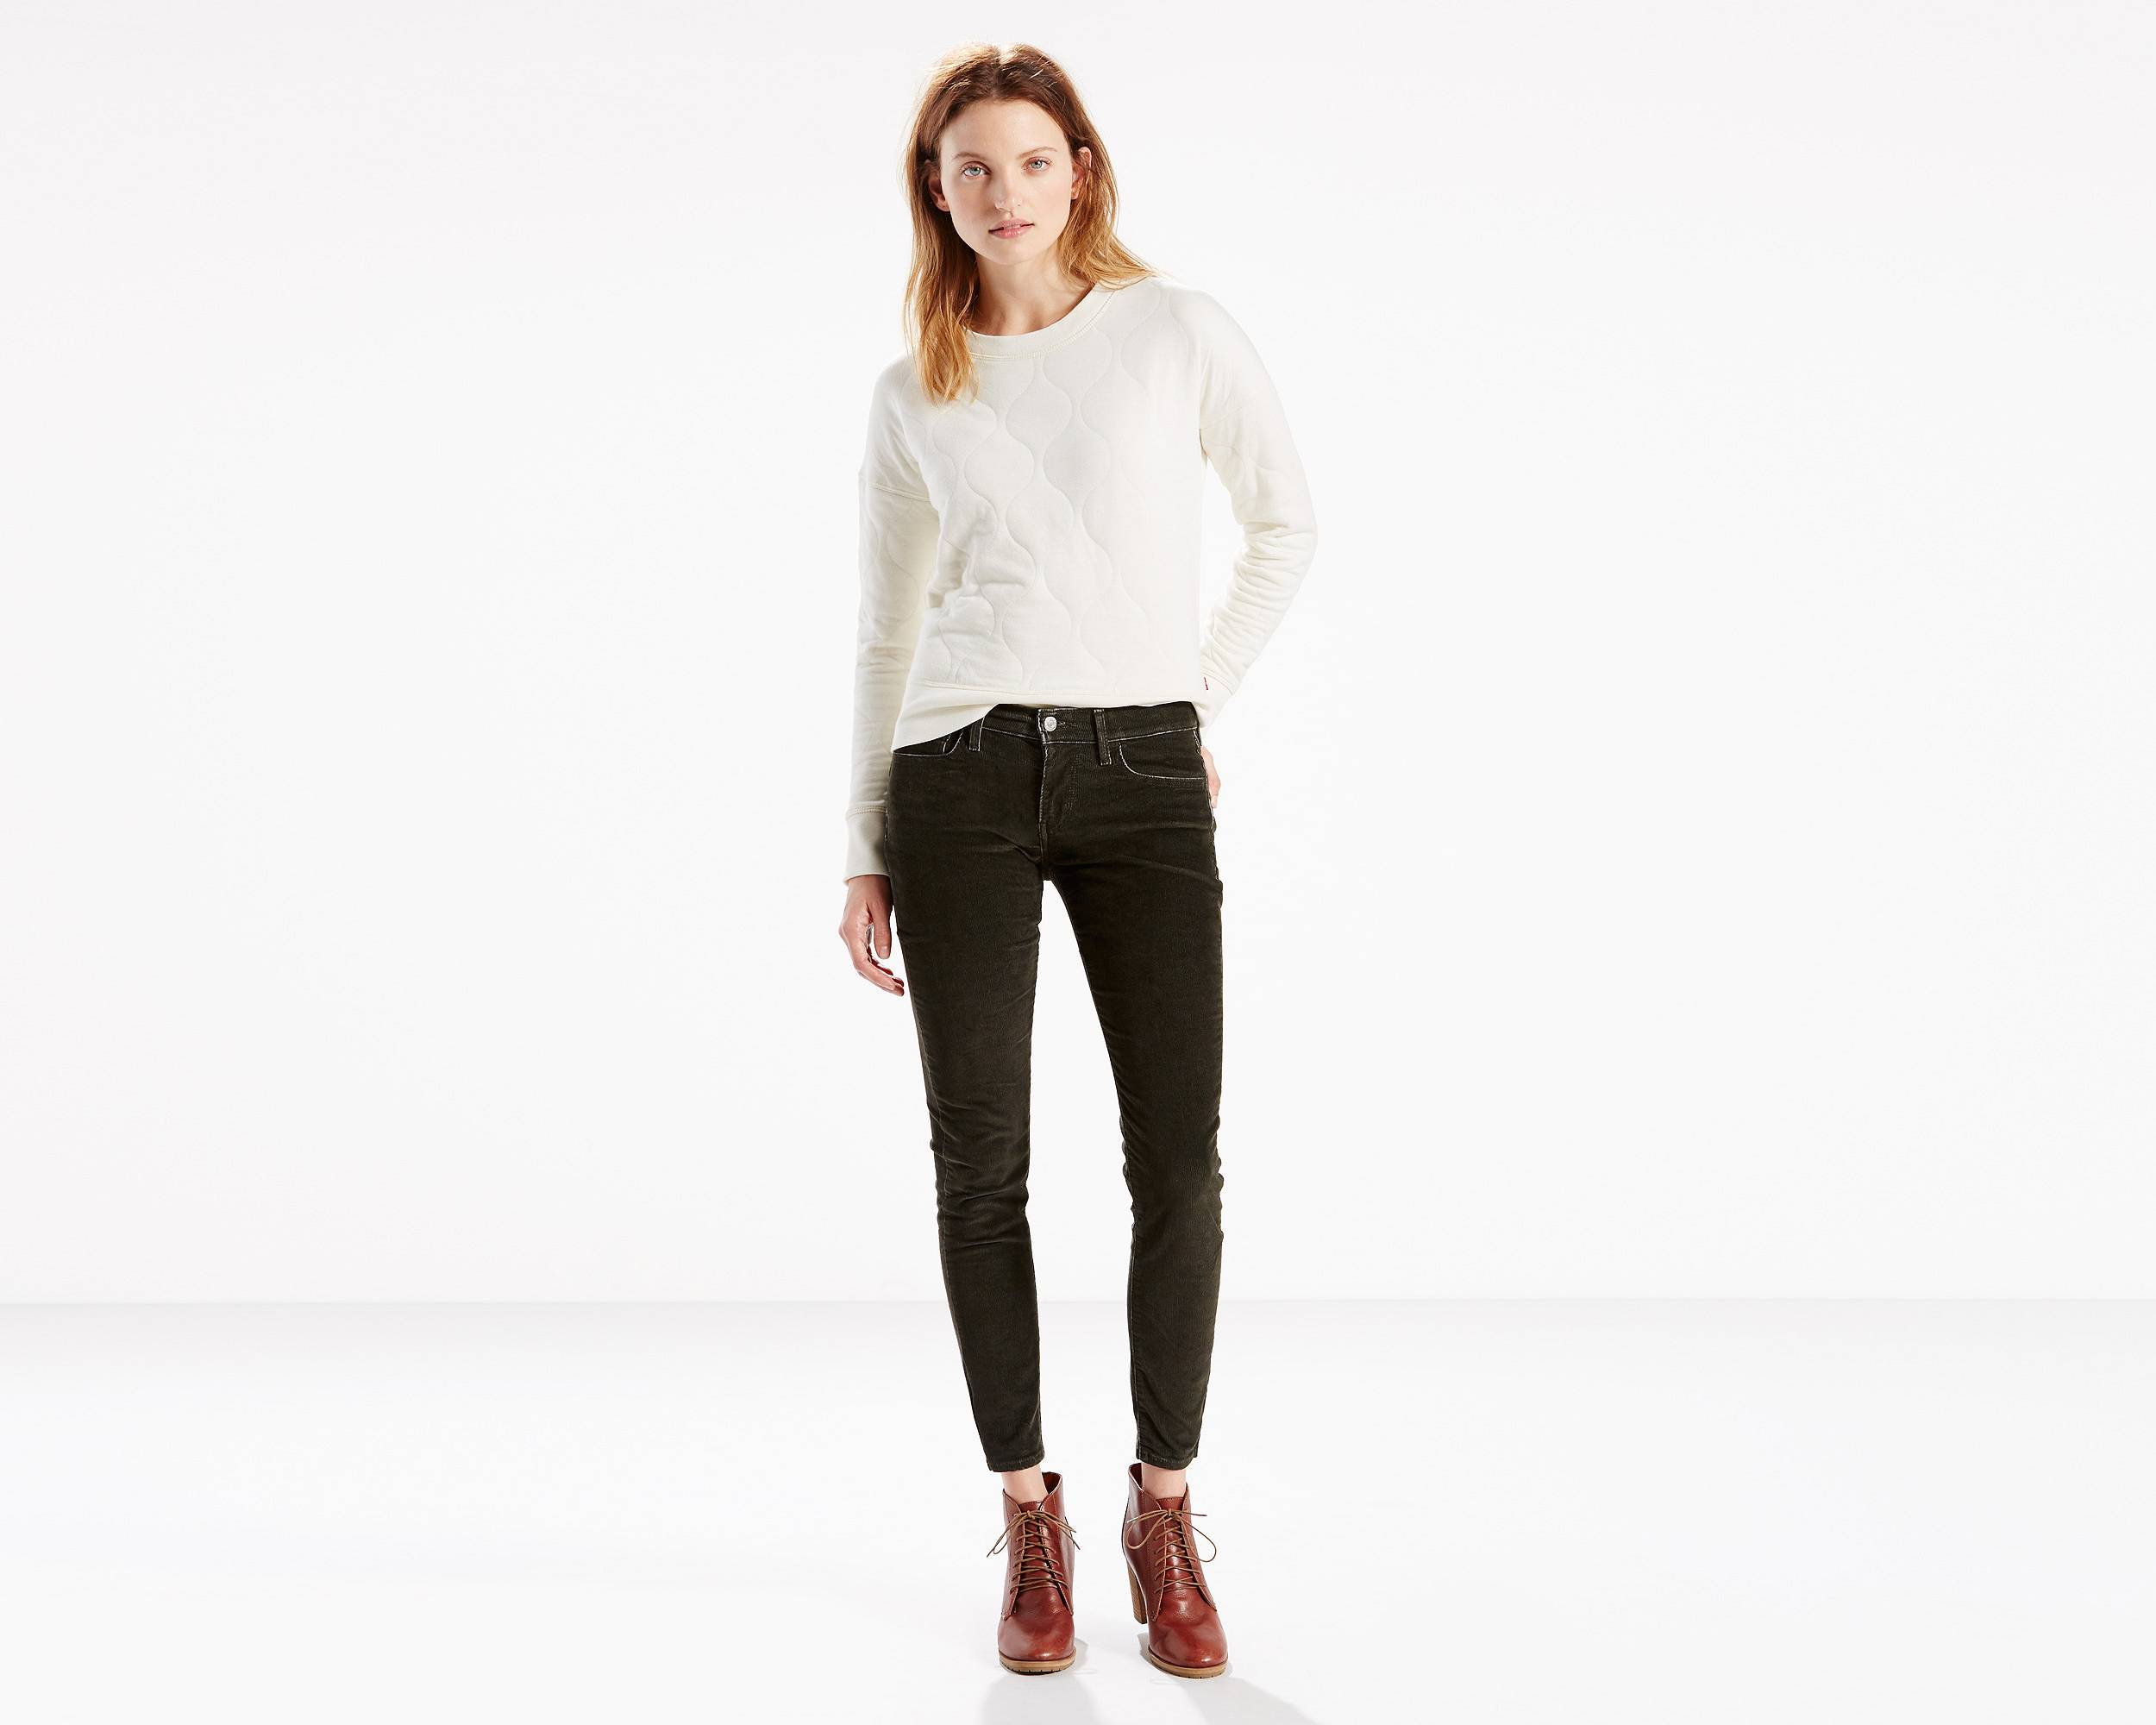 710 Corduroy Super Skinny Jeans   Dark Grey  Levi&39s® United States